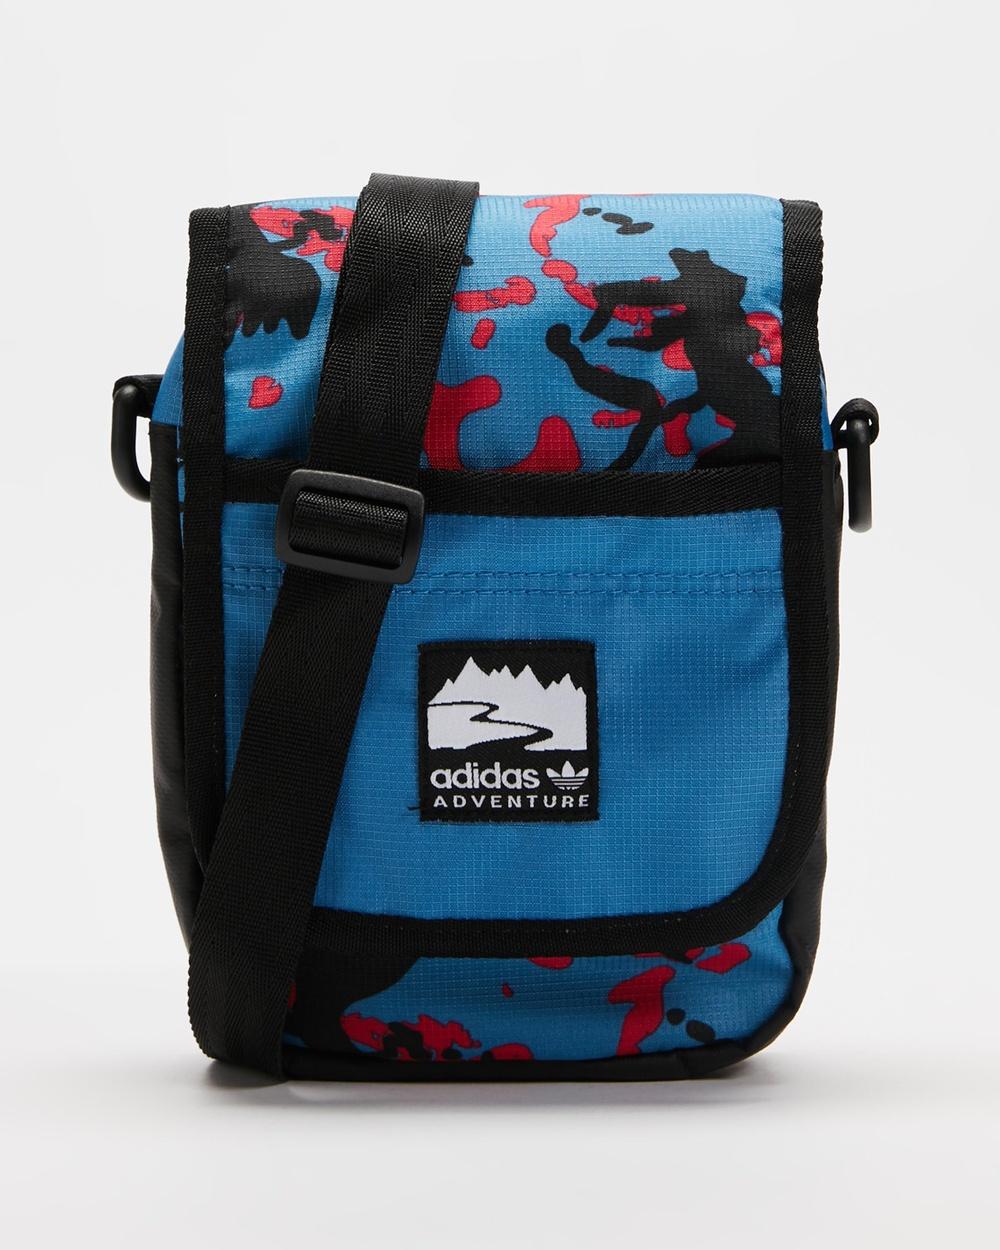 adidas Originals Adventure Flap Bag Bags Focus Blue, Core Pink & Black